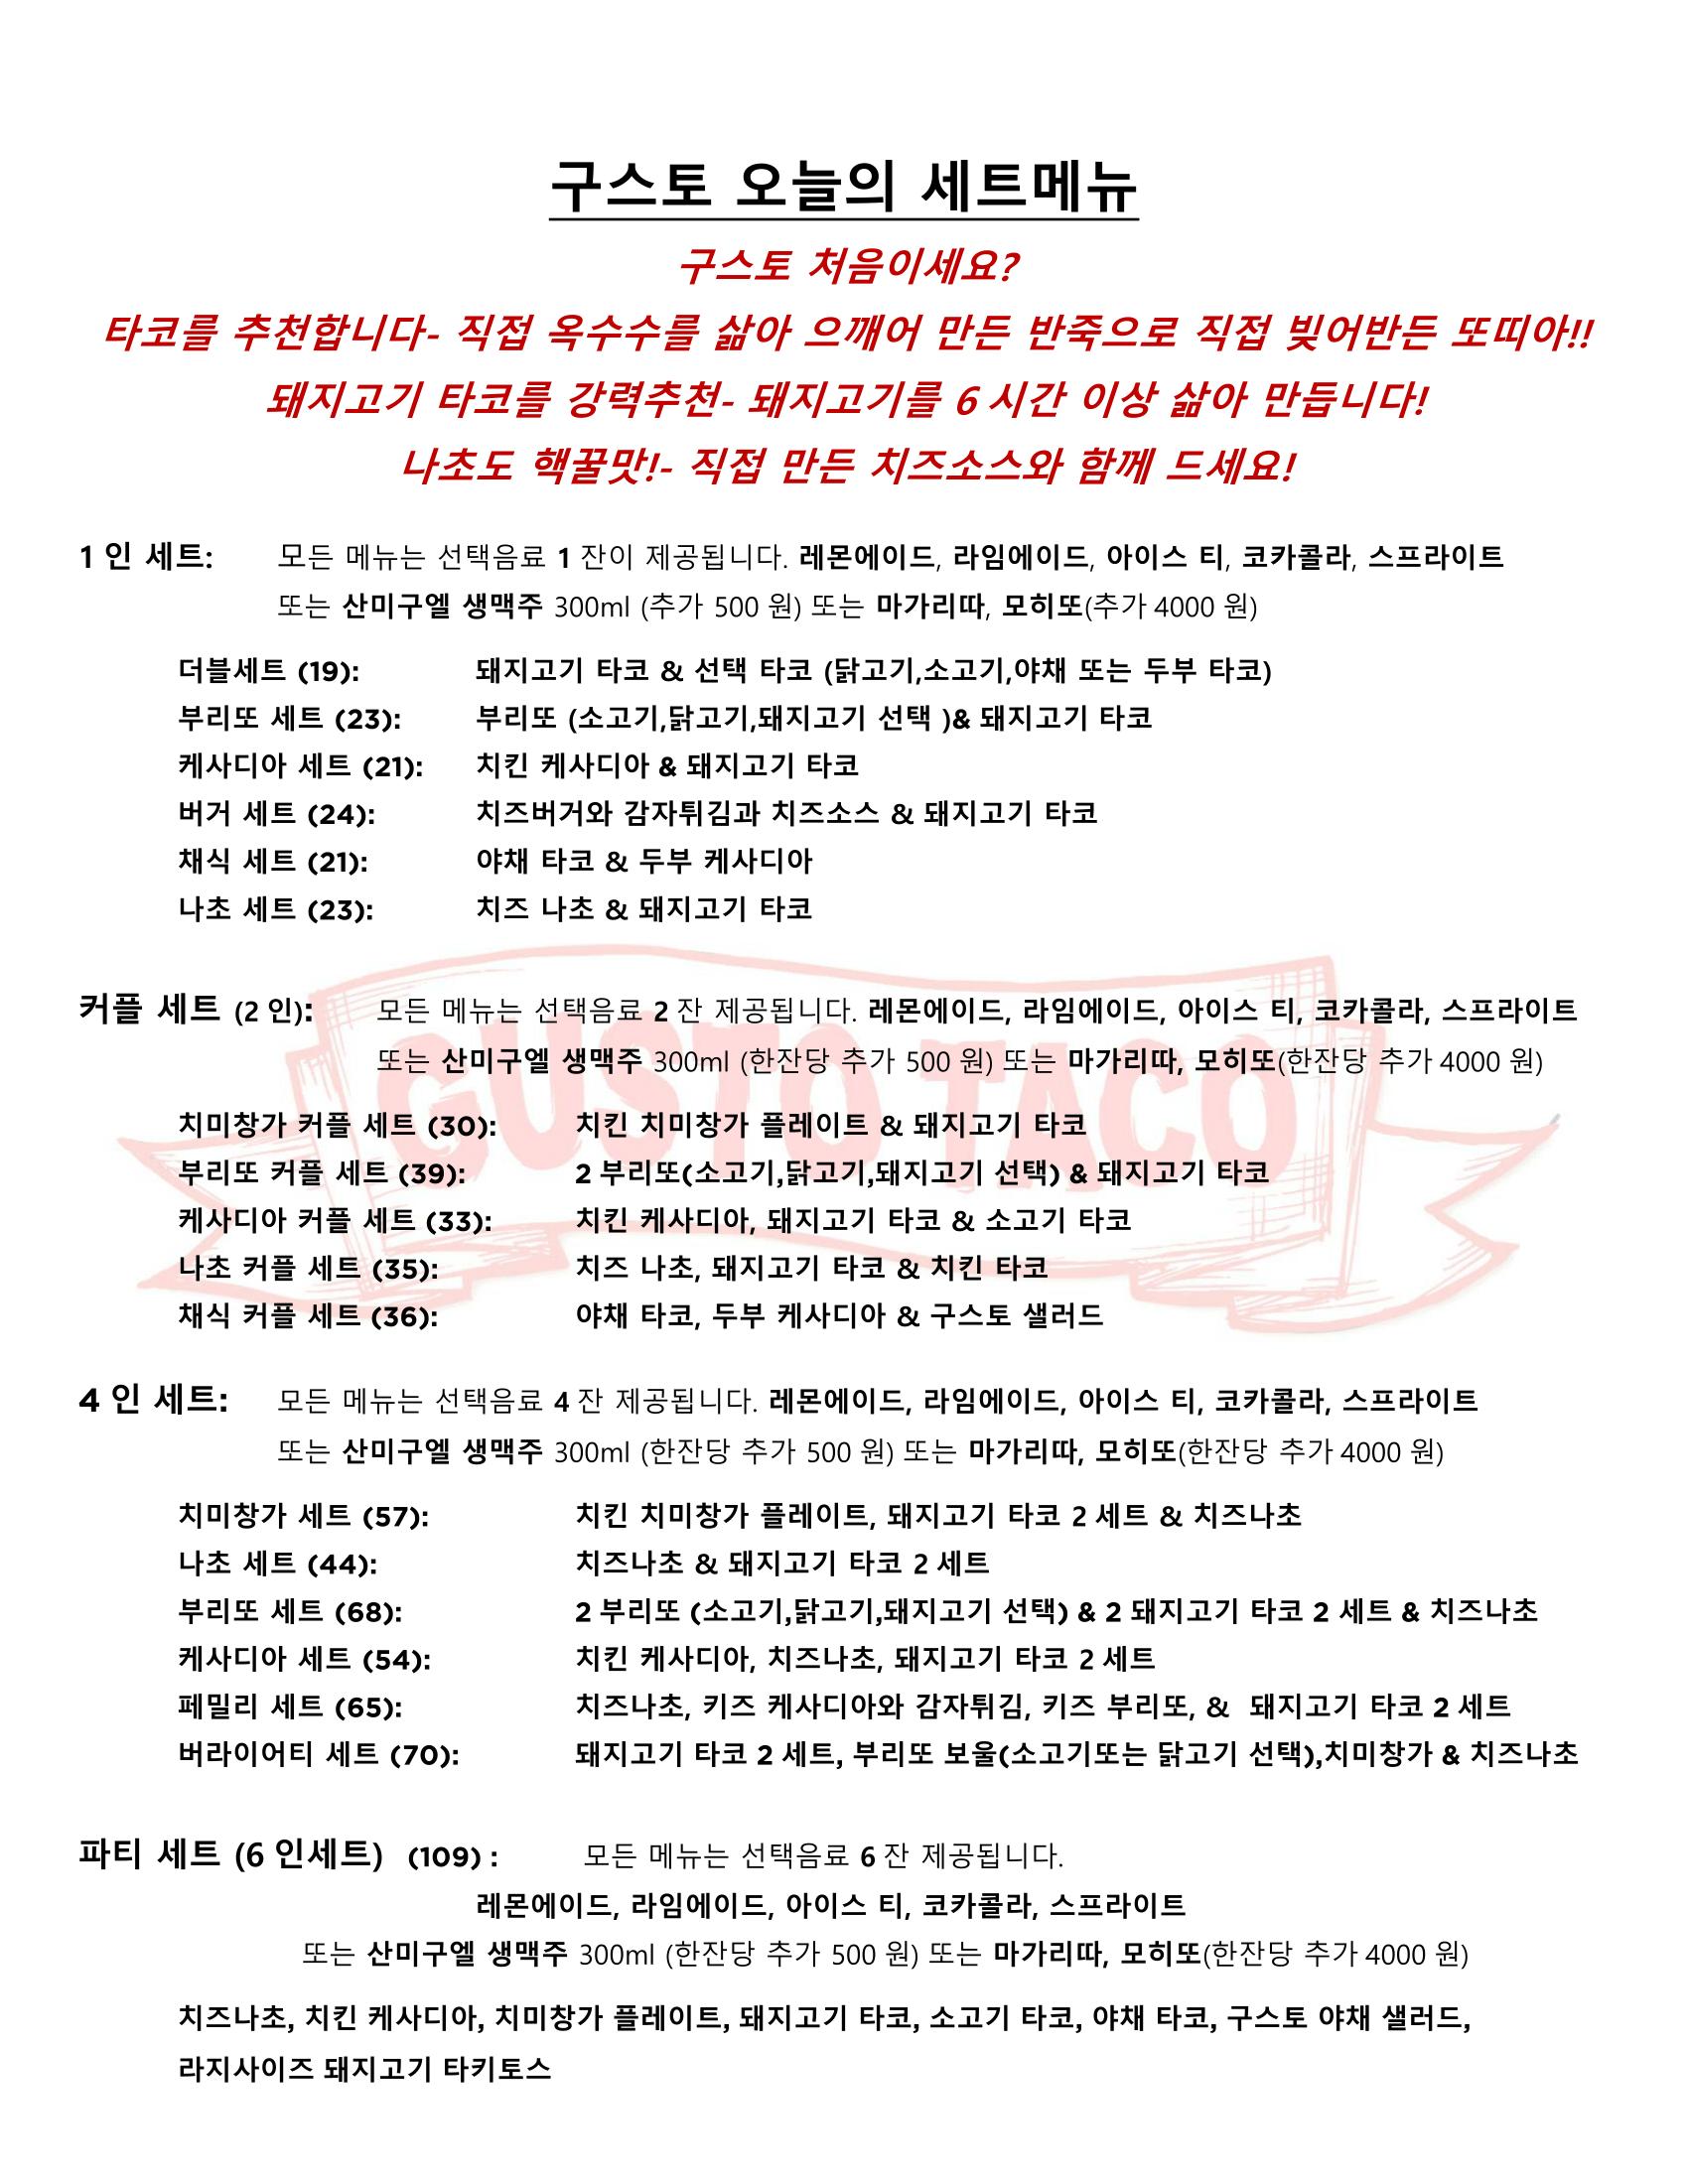 GUSTO SET MENU KOREAN revised final20180202 (1)-1.png